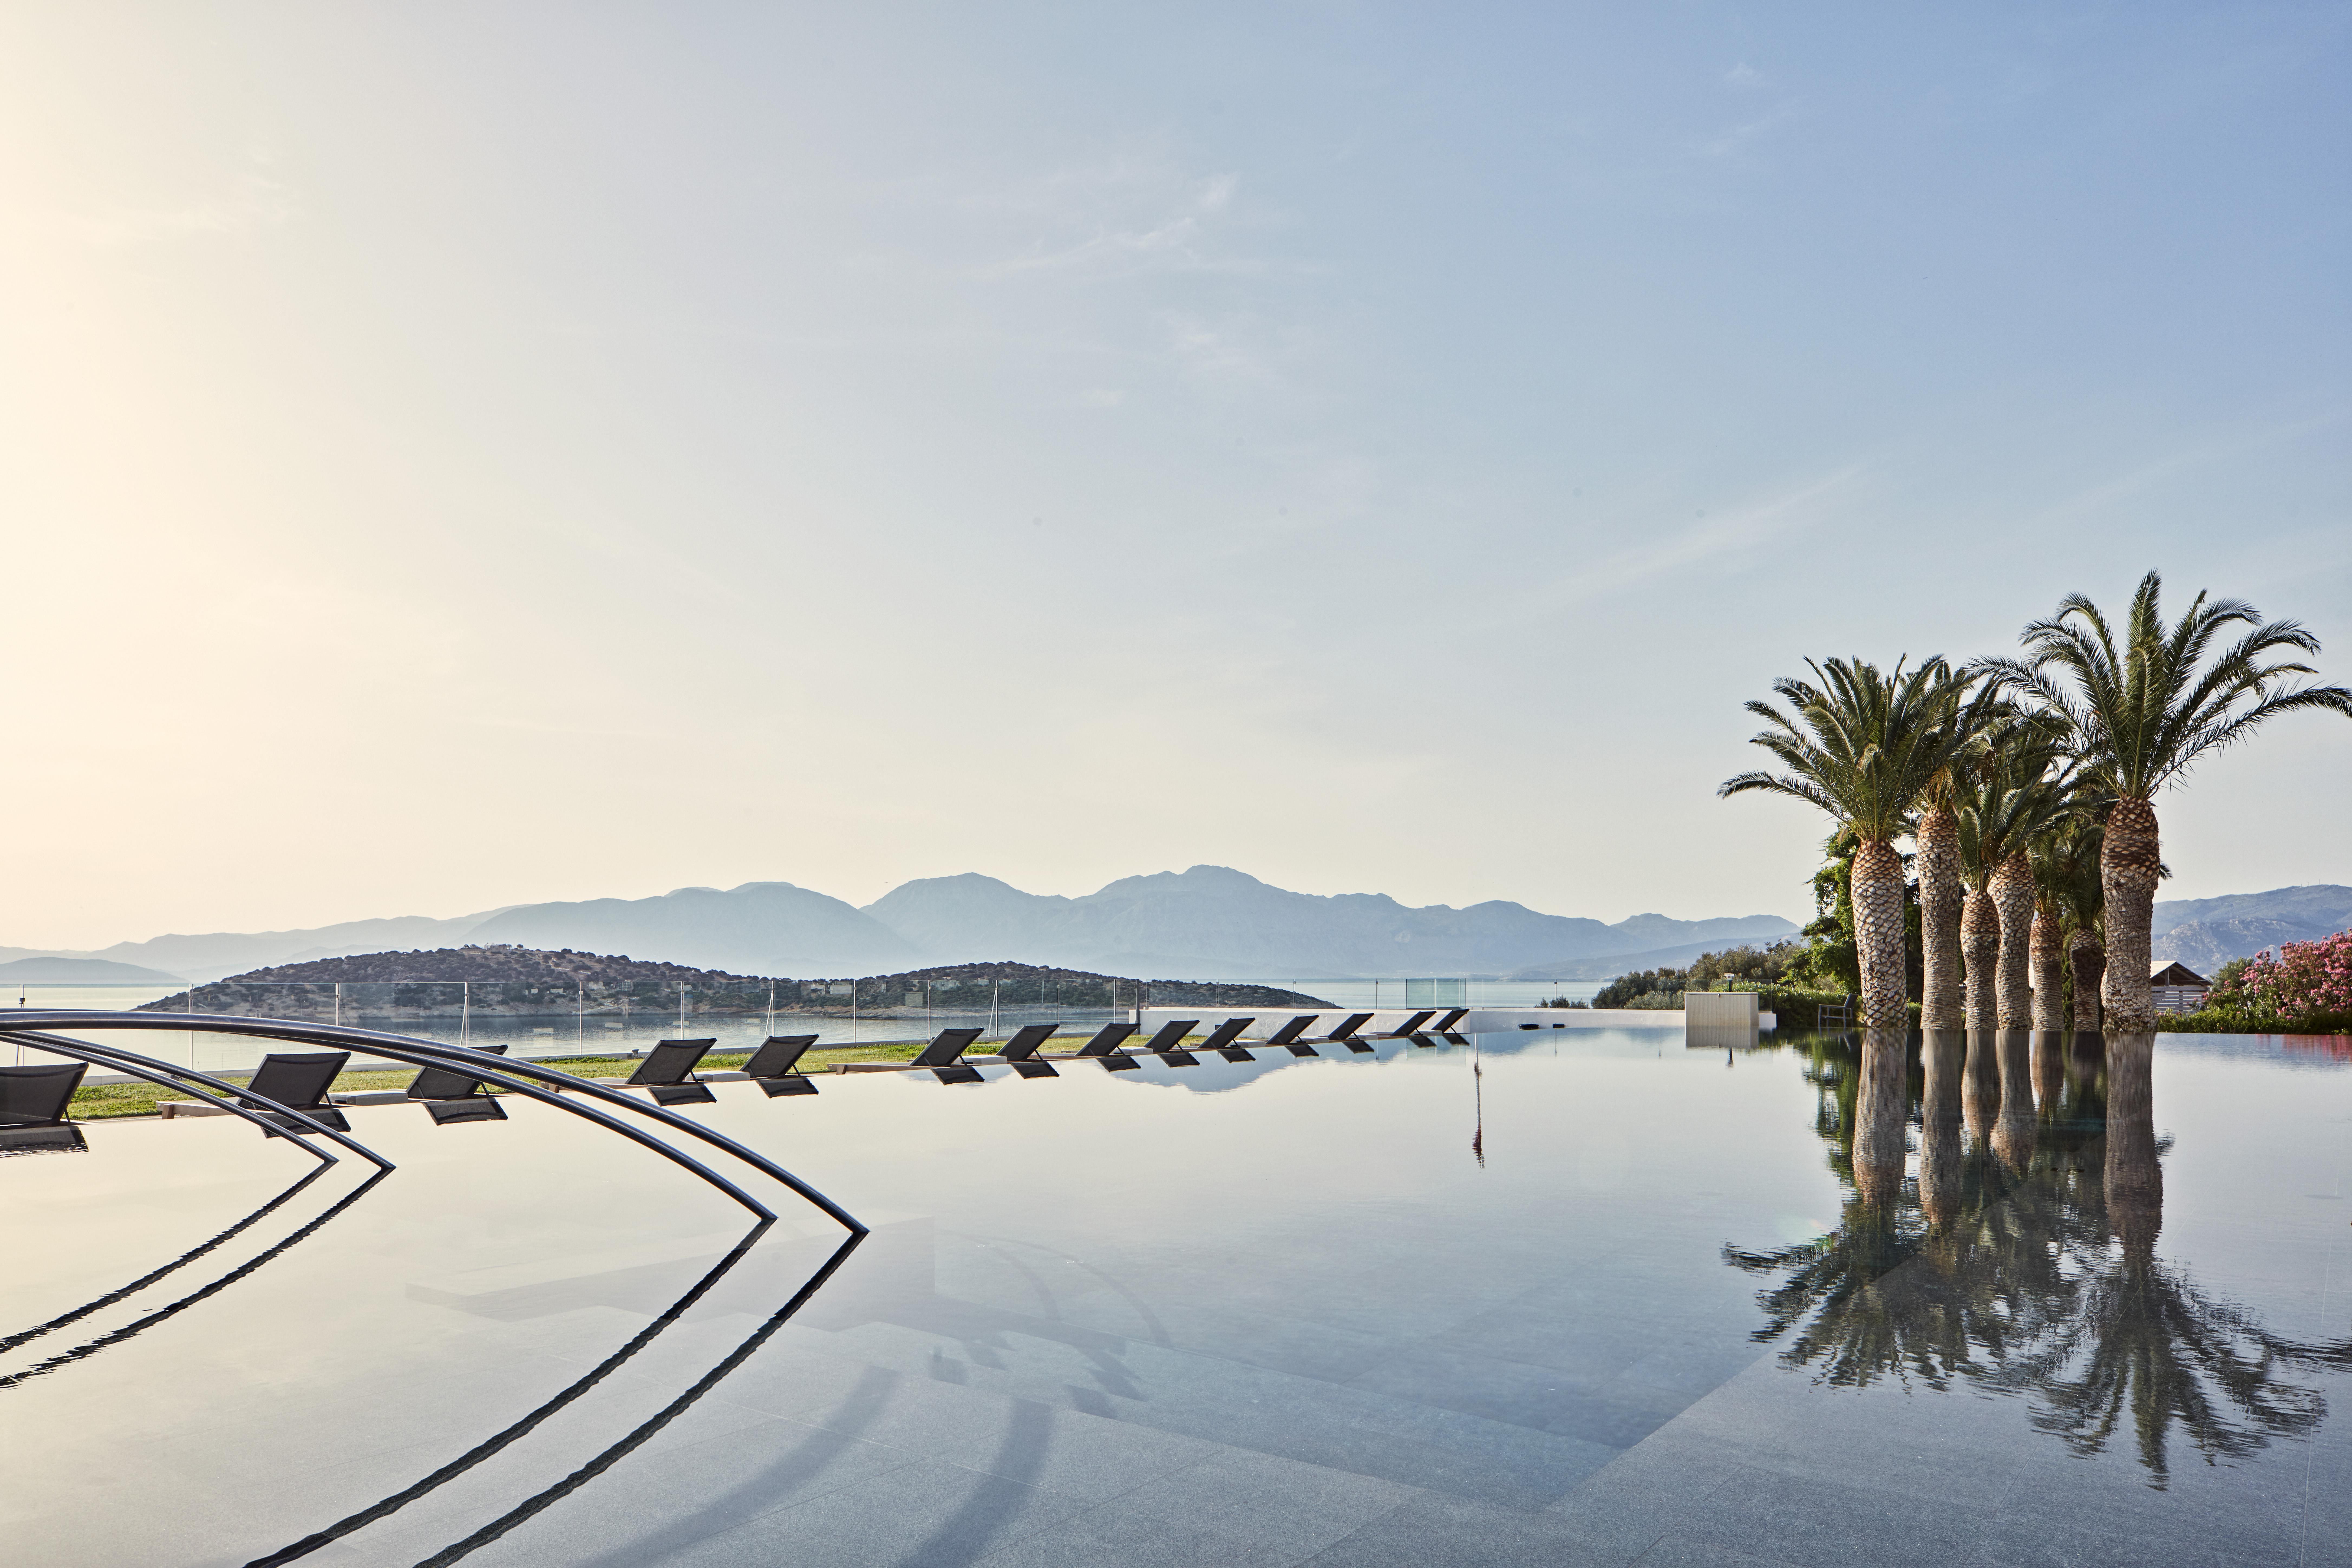 Minos Palace Hotel Agios Nikolaos